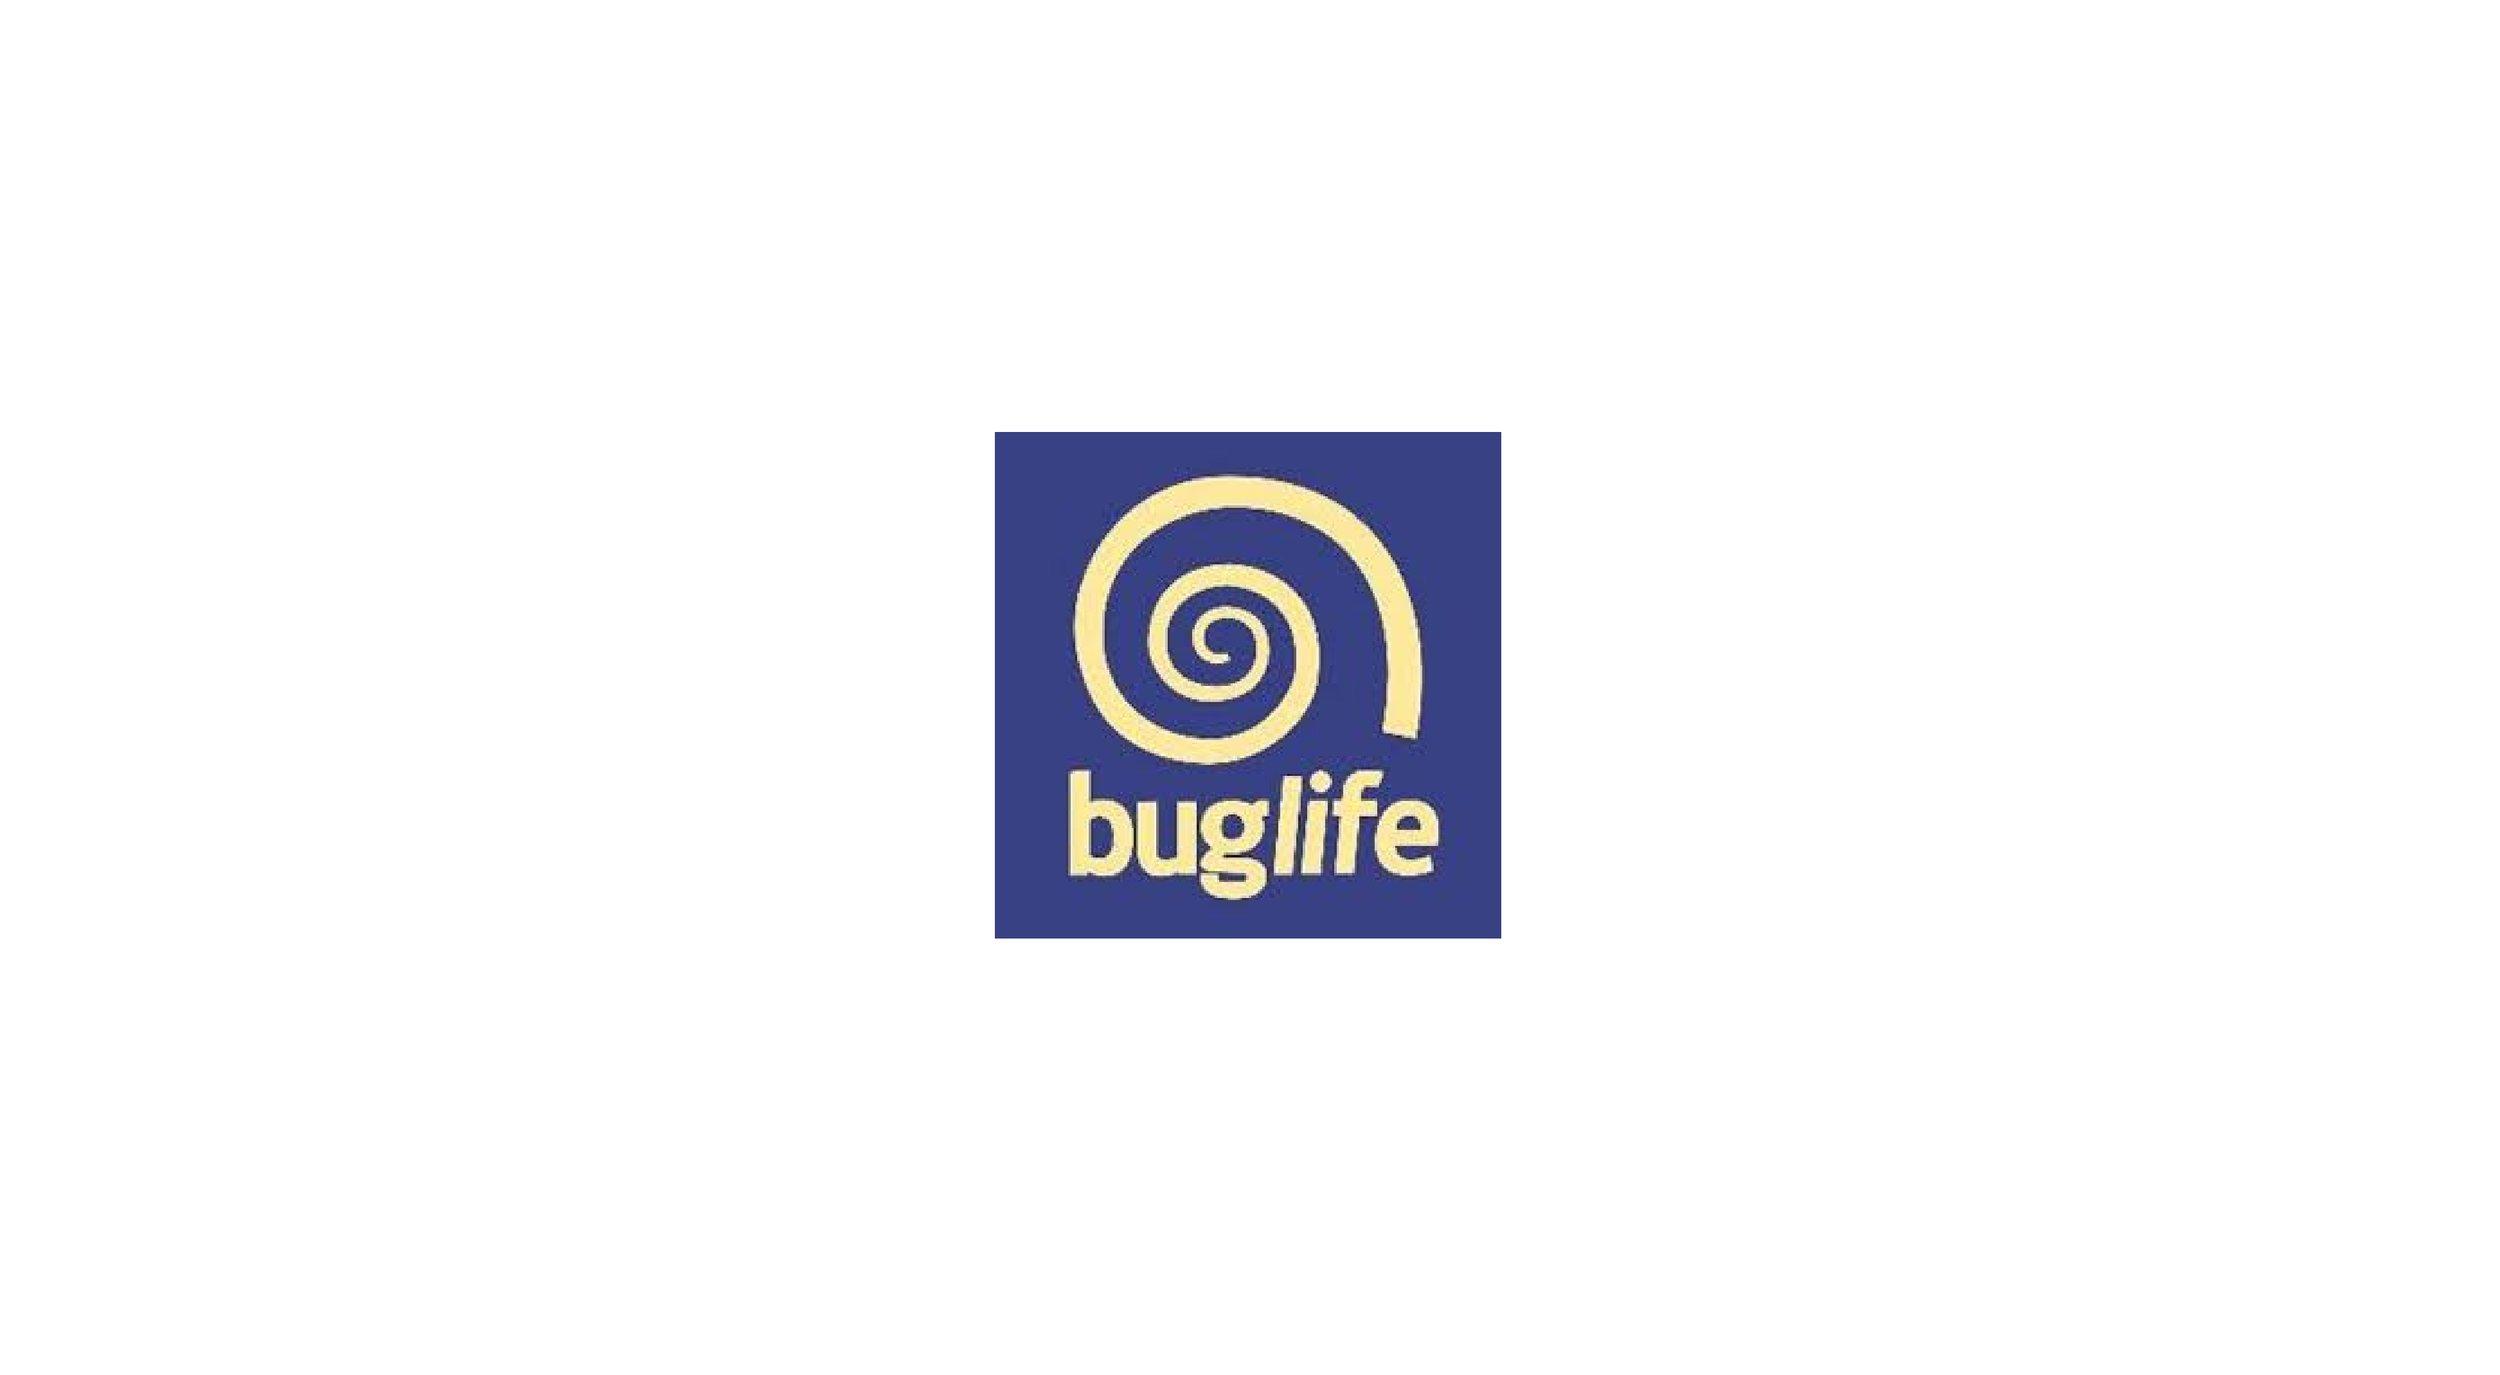 Buglife.jpg